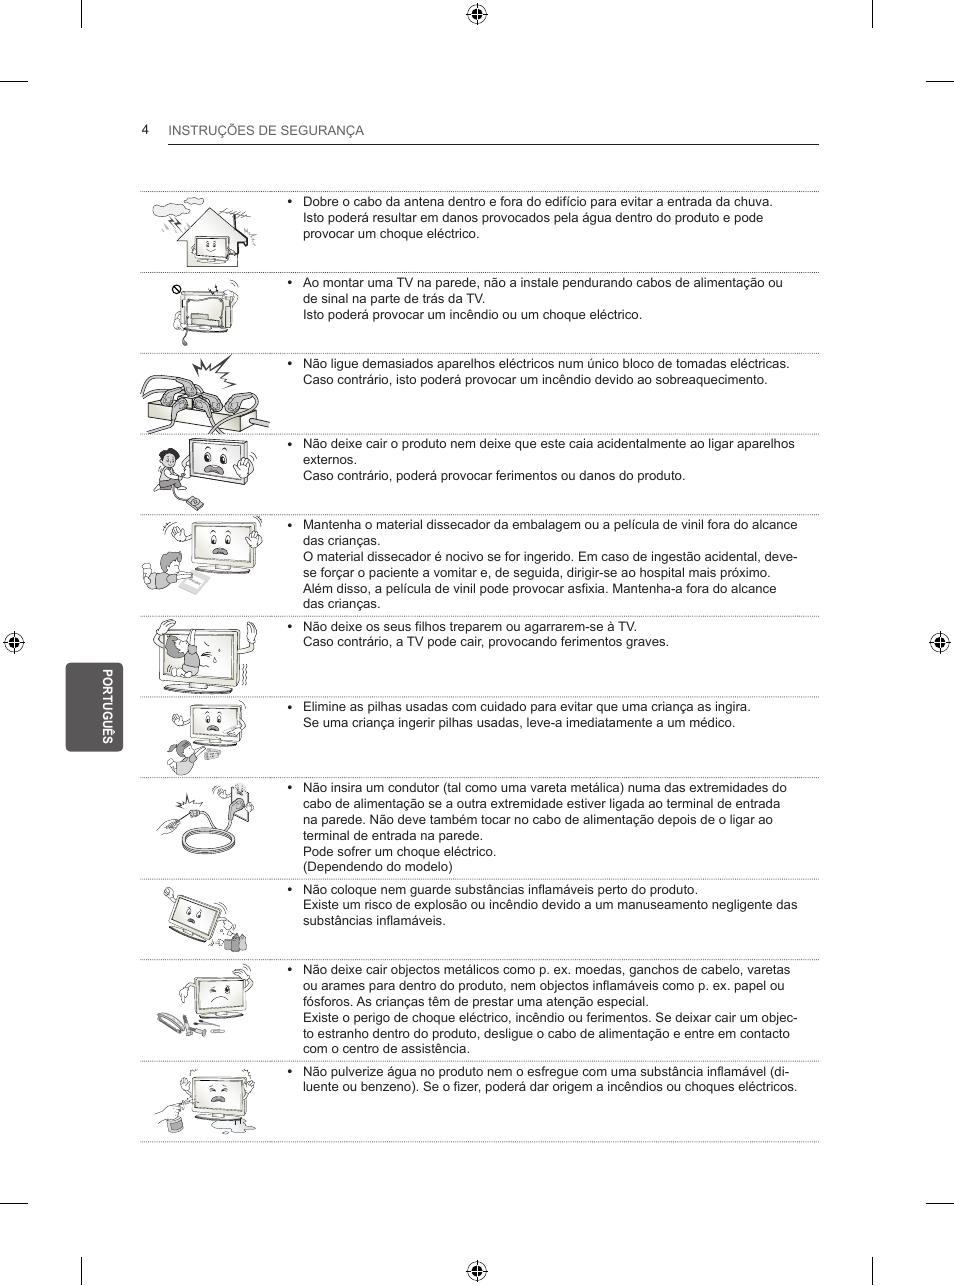 LG 50PB560U User Manual   Page 135   227   Original mode   Also for ... f350d221d0